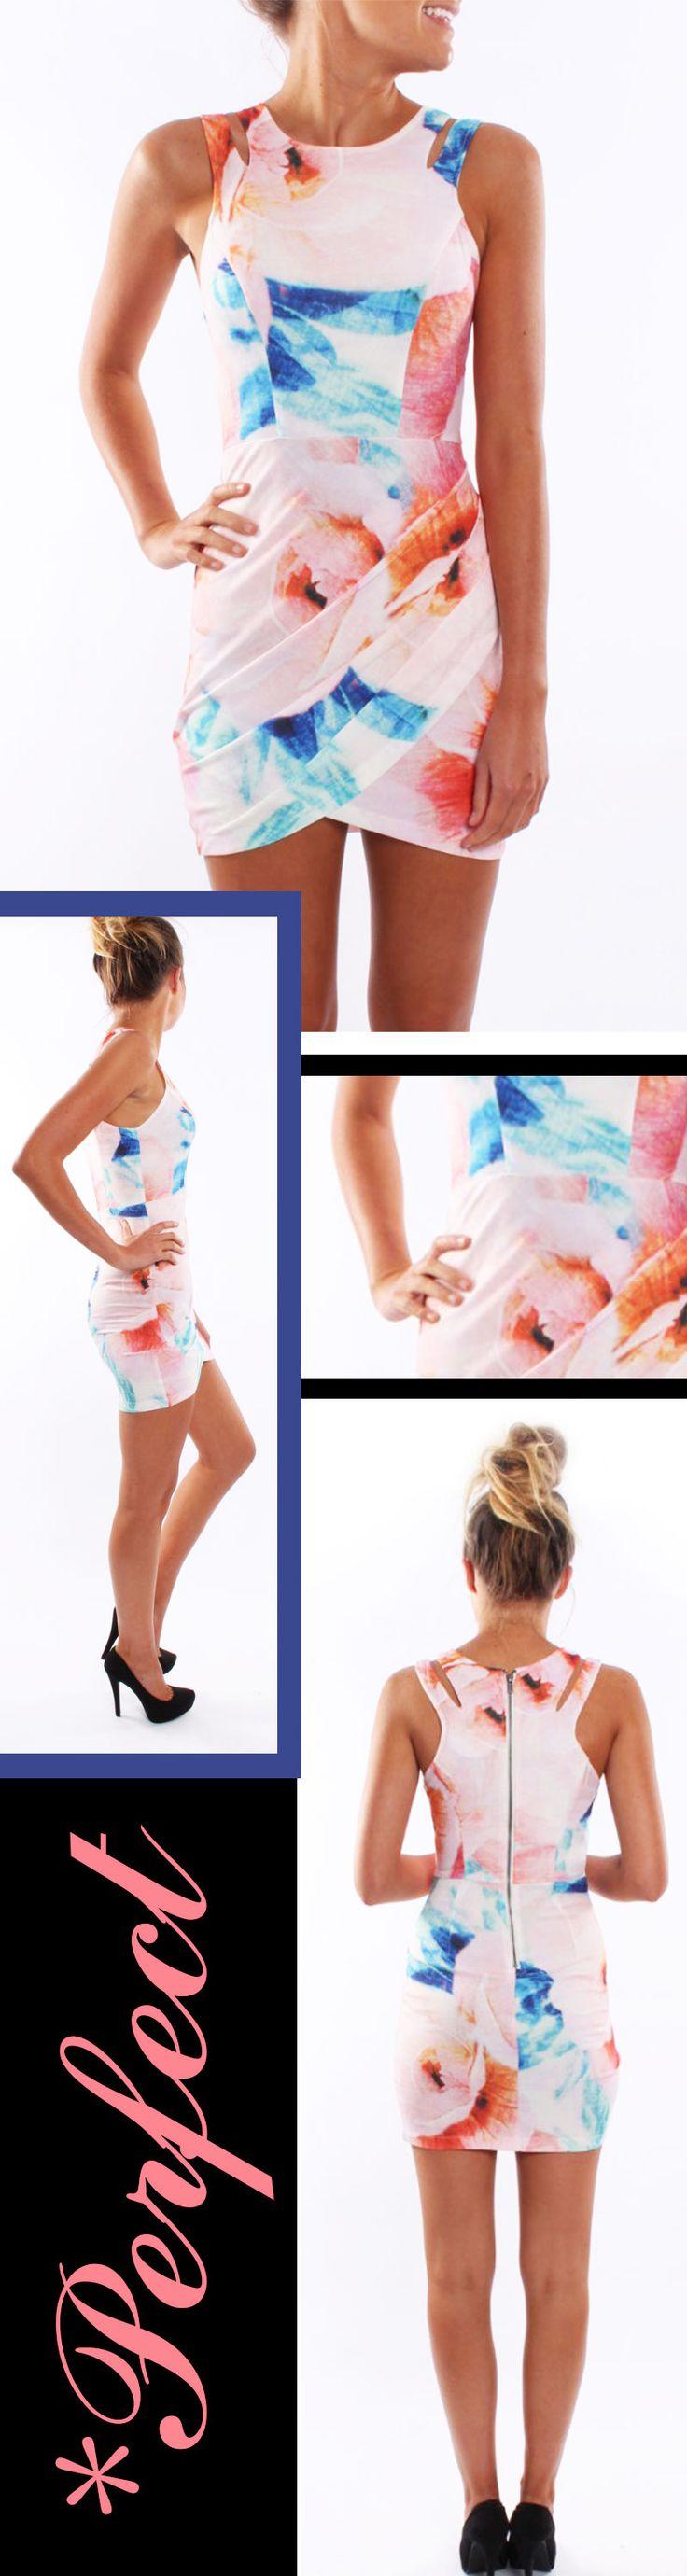 Pink Sleeveless Floral Print Bodycon Dress